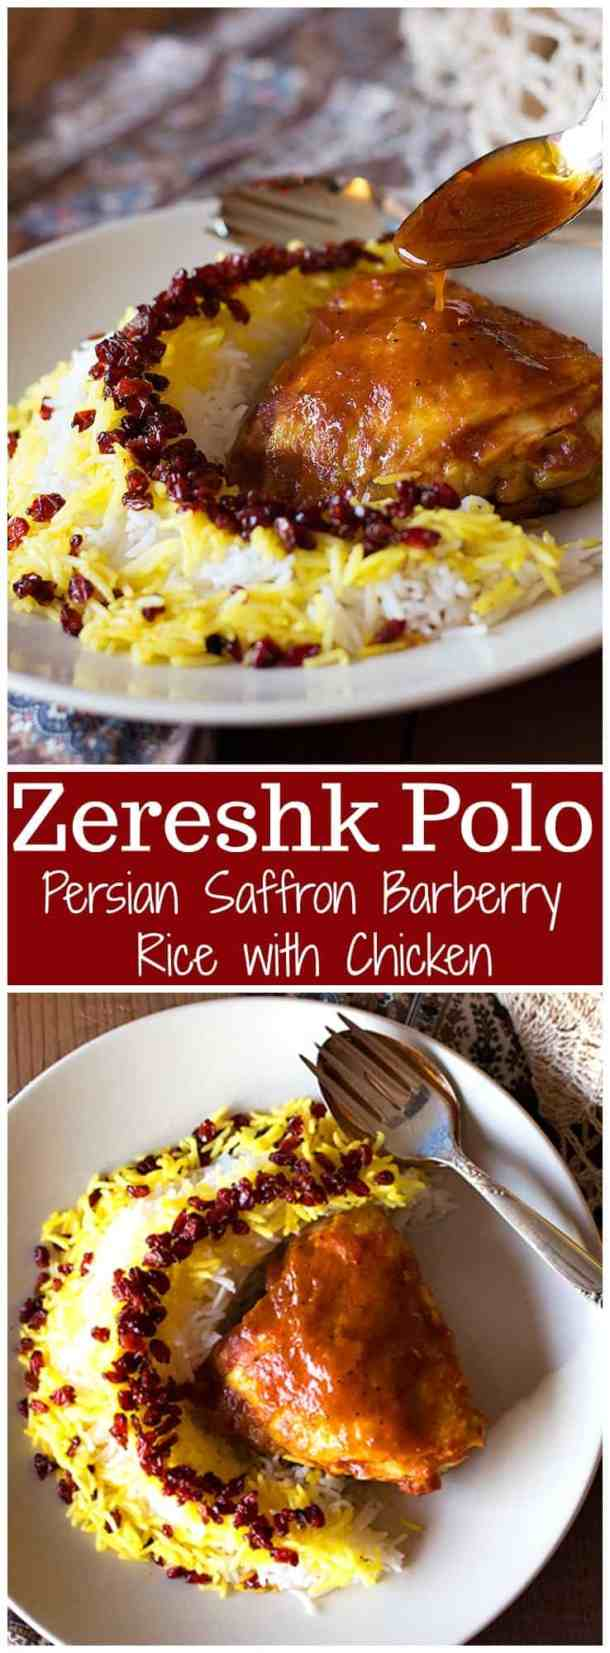 Zereshk Polo   Zereshk Polo Morgh   Zereshk Polo Recipe   Zereshk Polo Chicken   Zereshk Polo Ba Morgh   Zereshk Polo Recipe Persian Rice   Persian Food   Persian Recipes   Barberry Rice   Barberry Saffron Rice